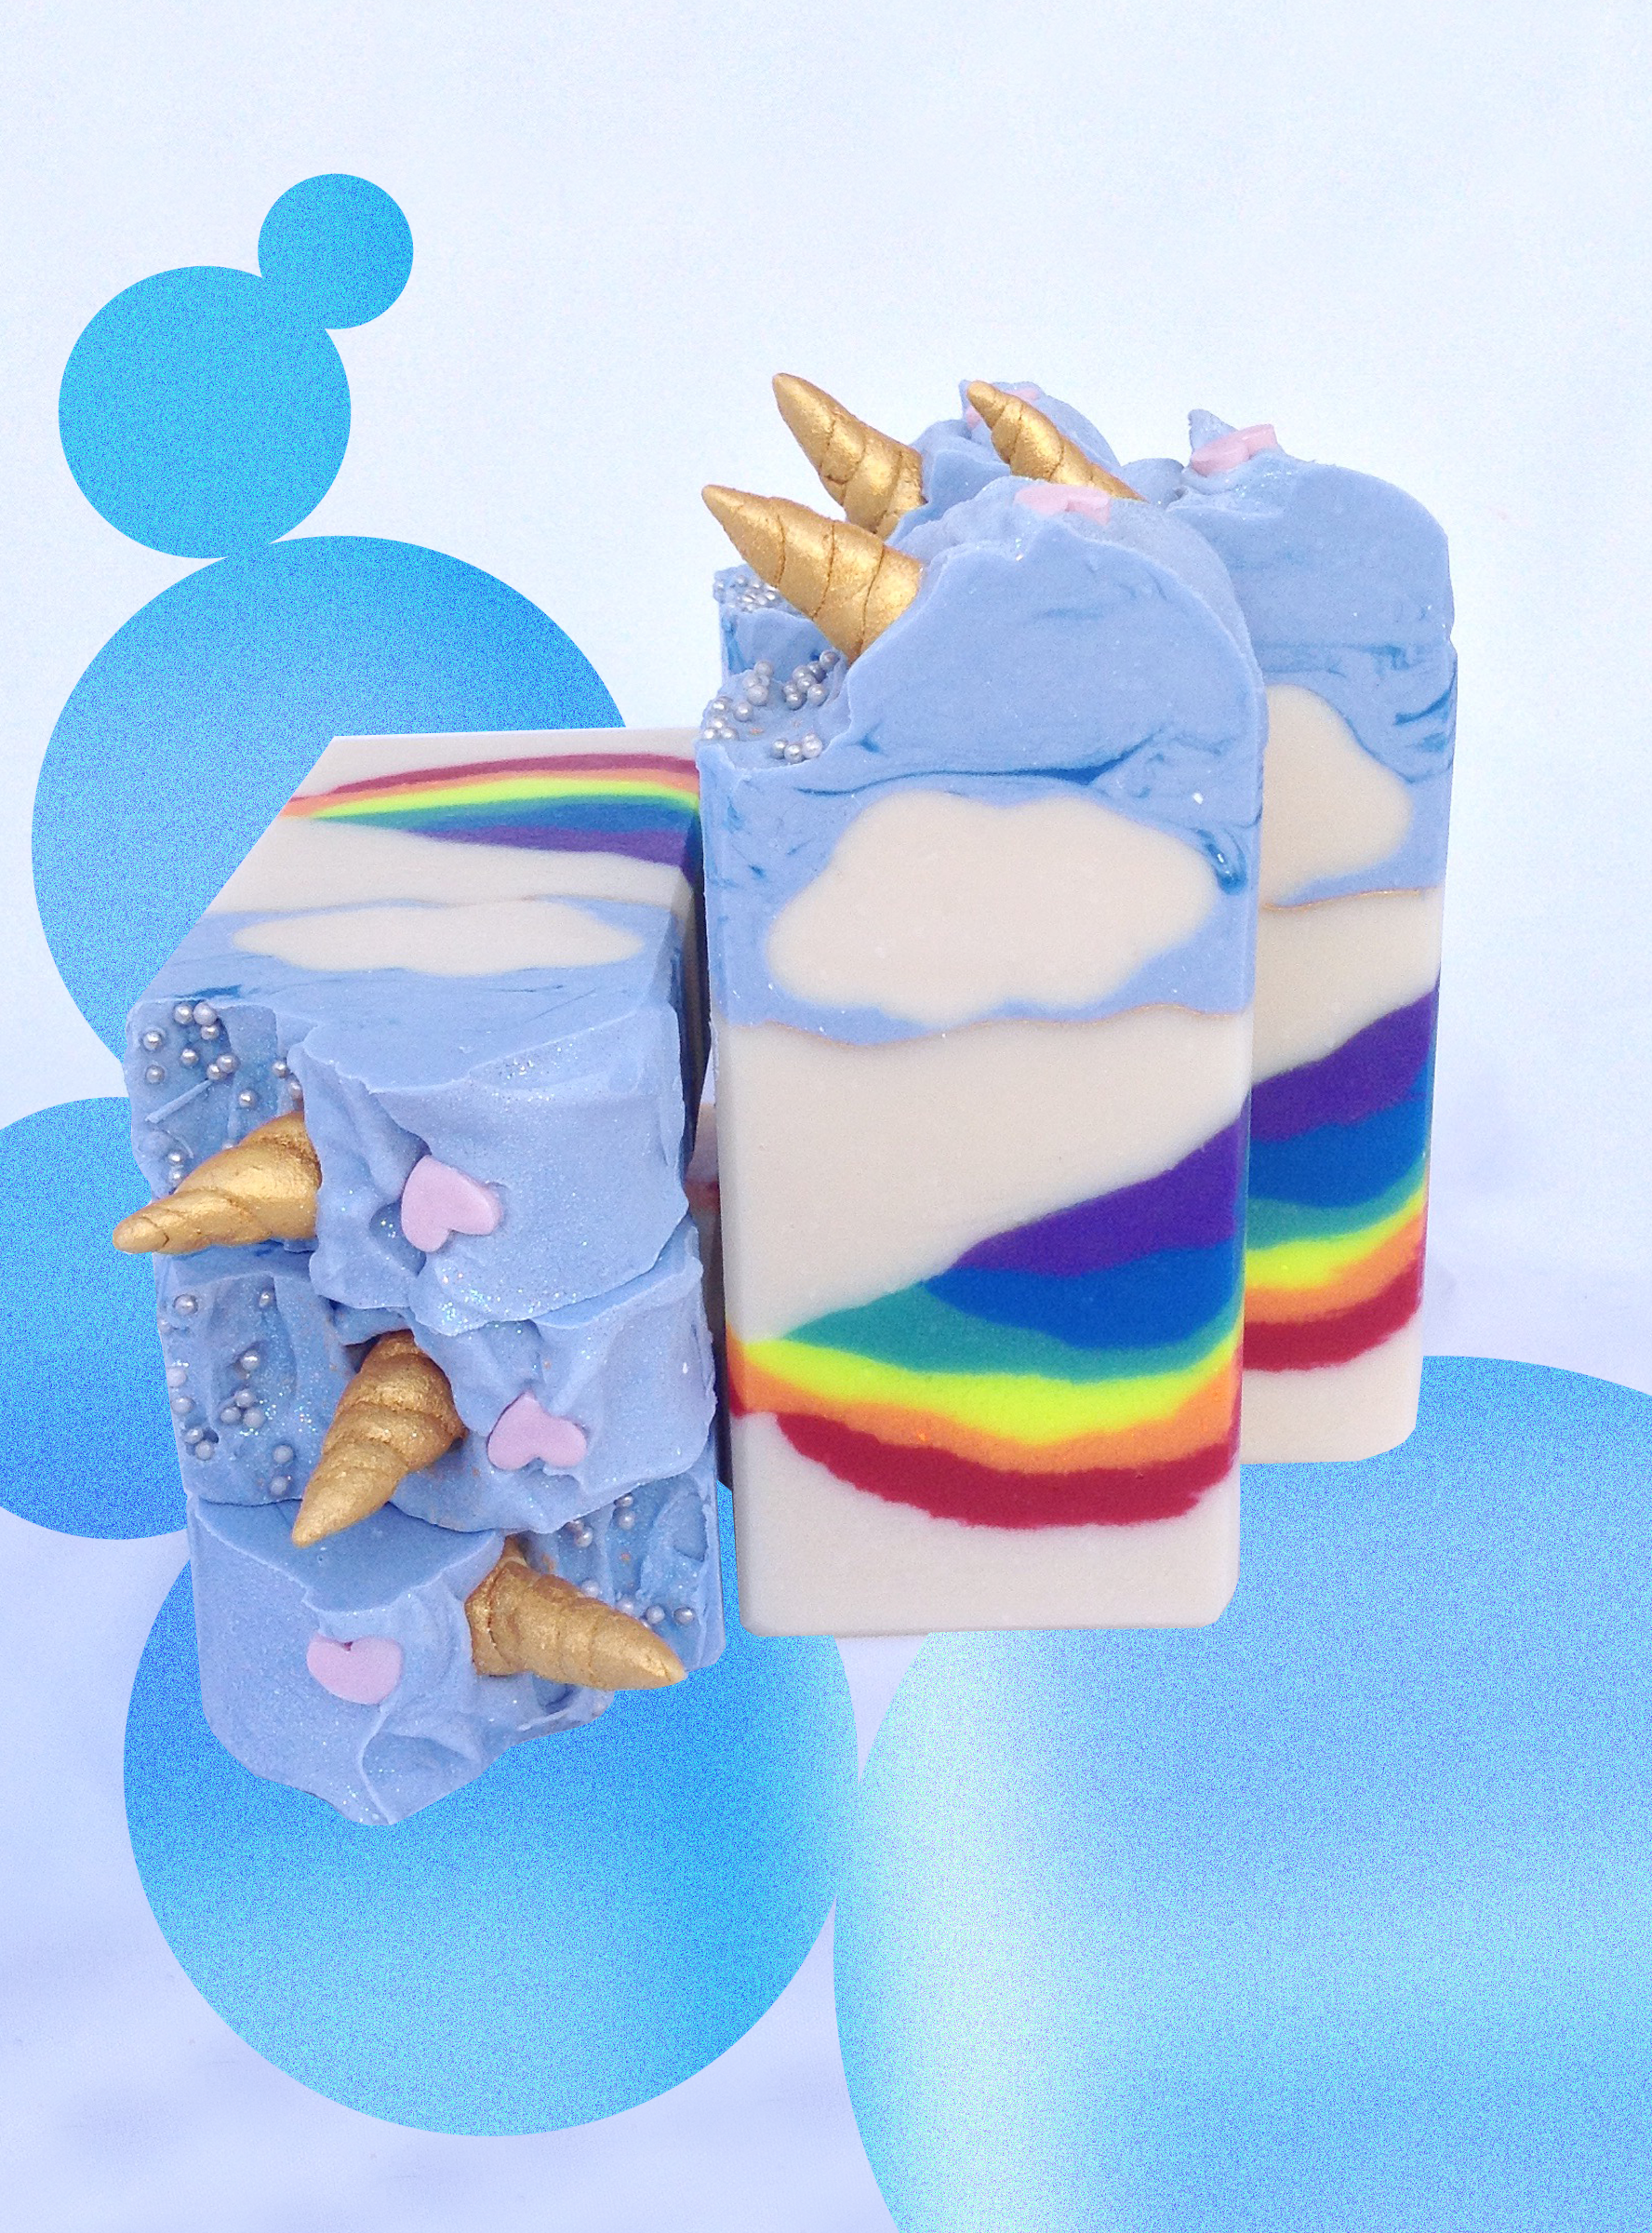 This Unicorn Bath Soap Has Us Believing In Magic | Unicorns, Bath ...